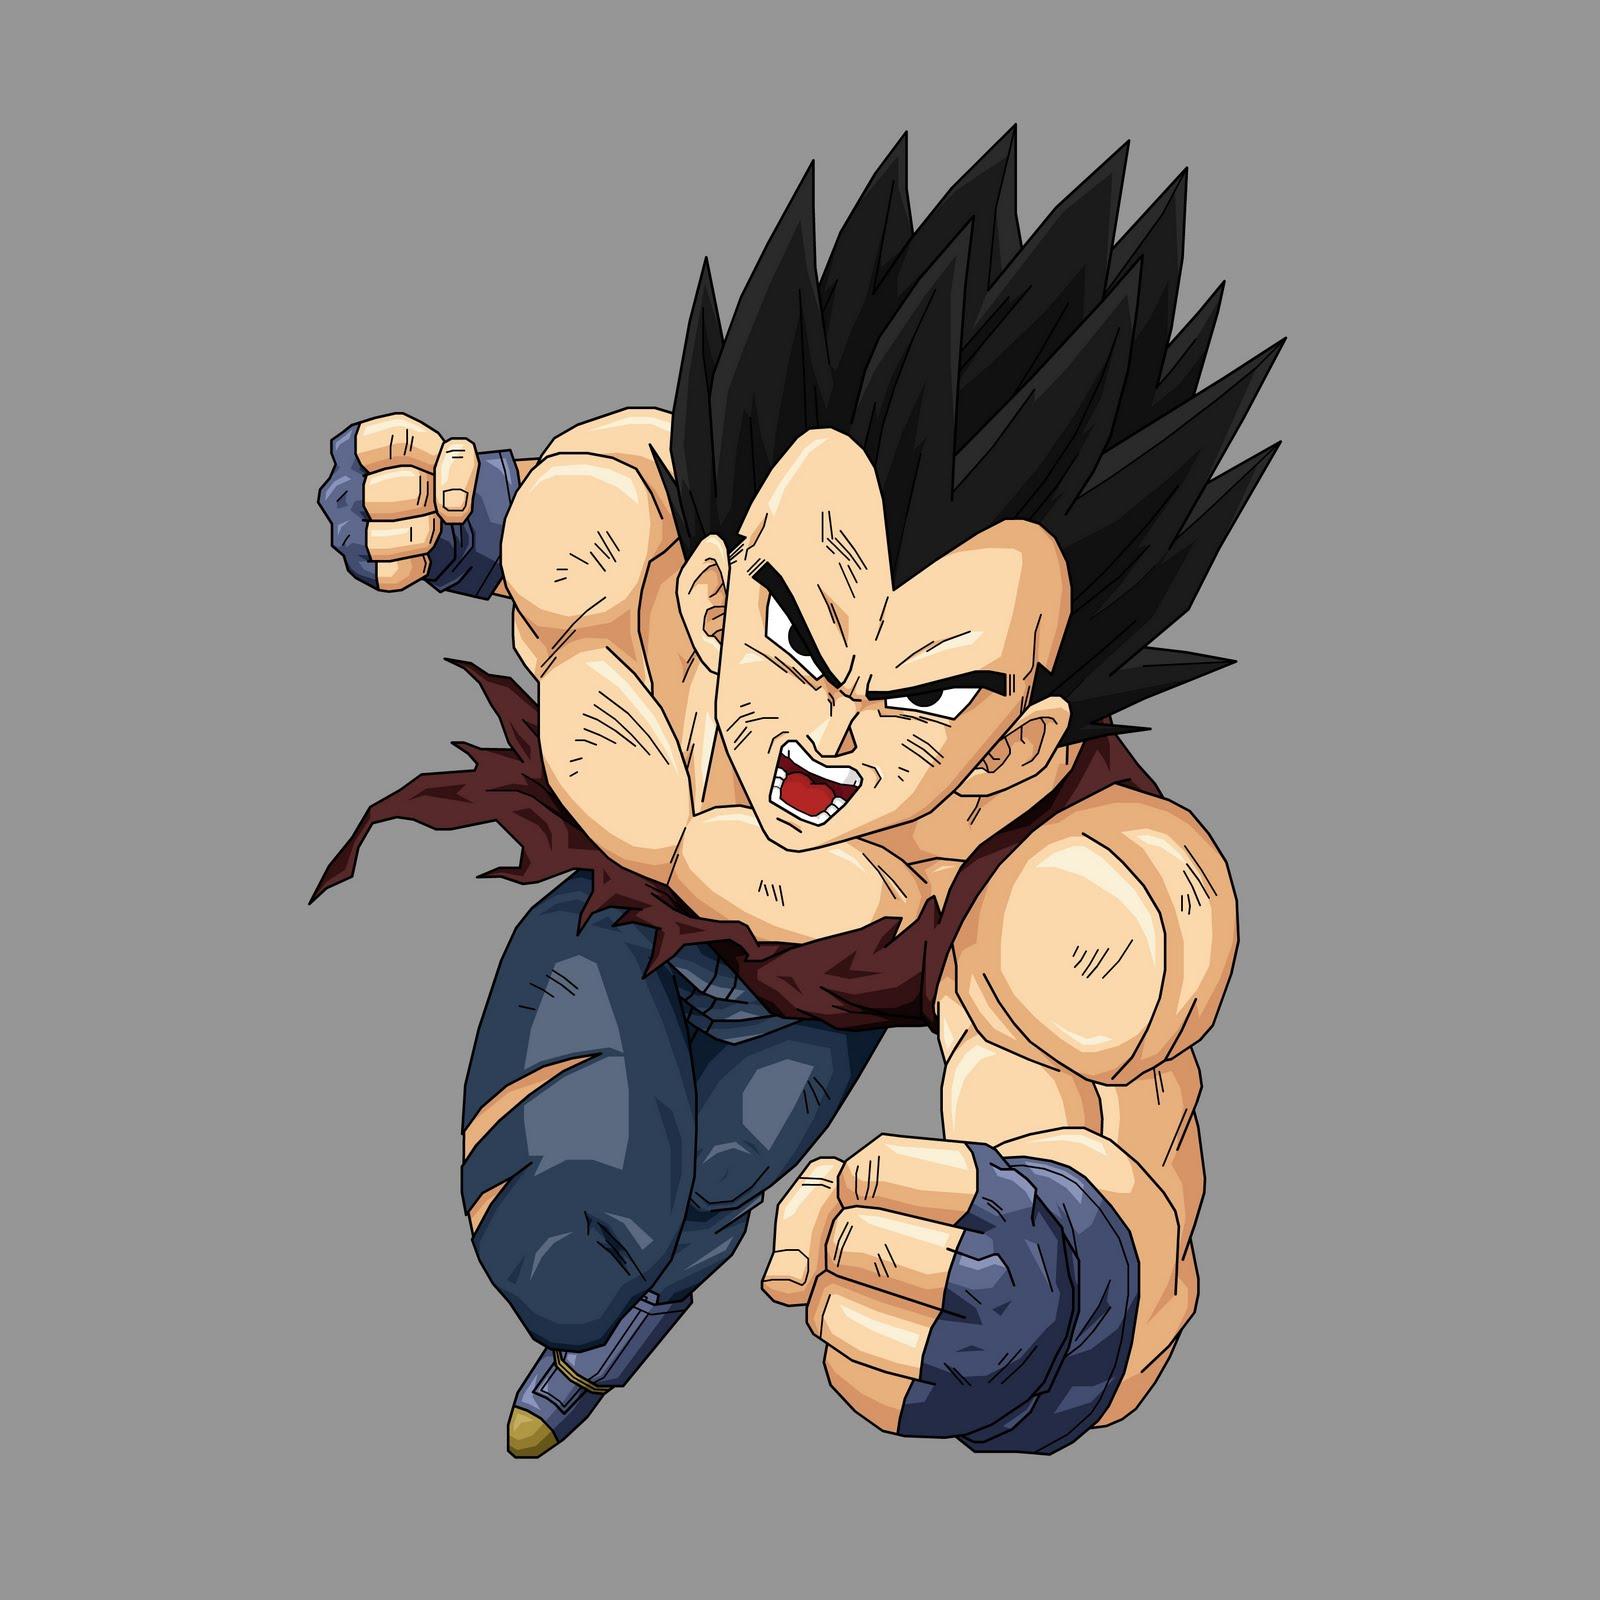 Goku y vegeta vegeta gt renders - Vegeta dragon ball gt ...